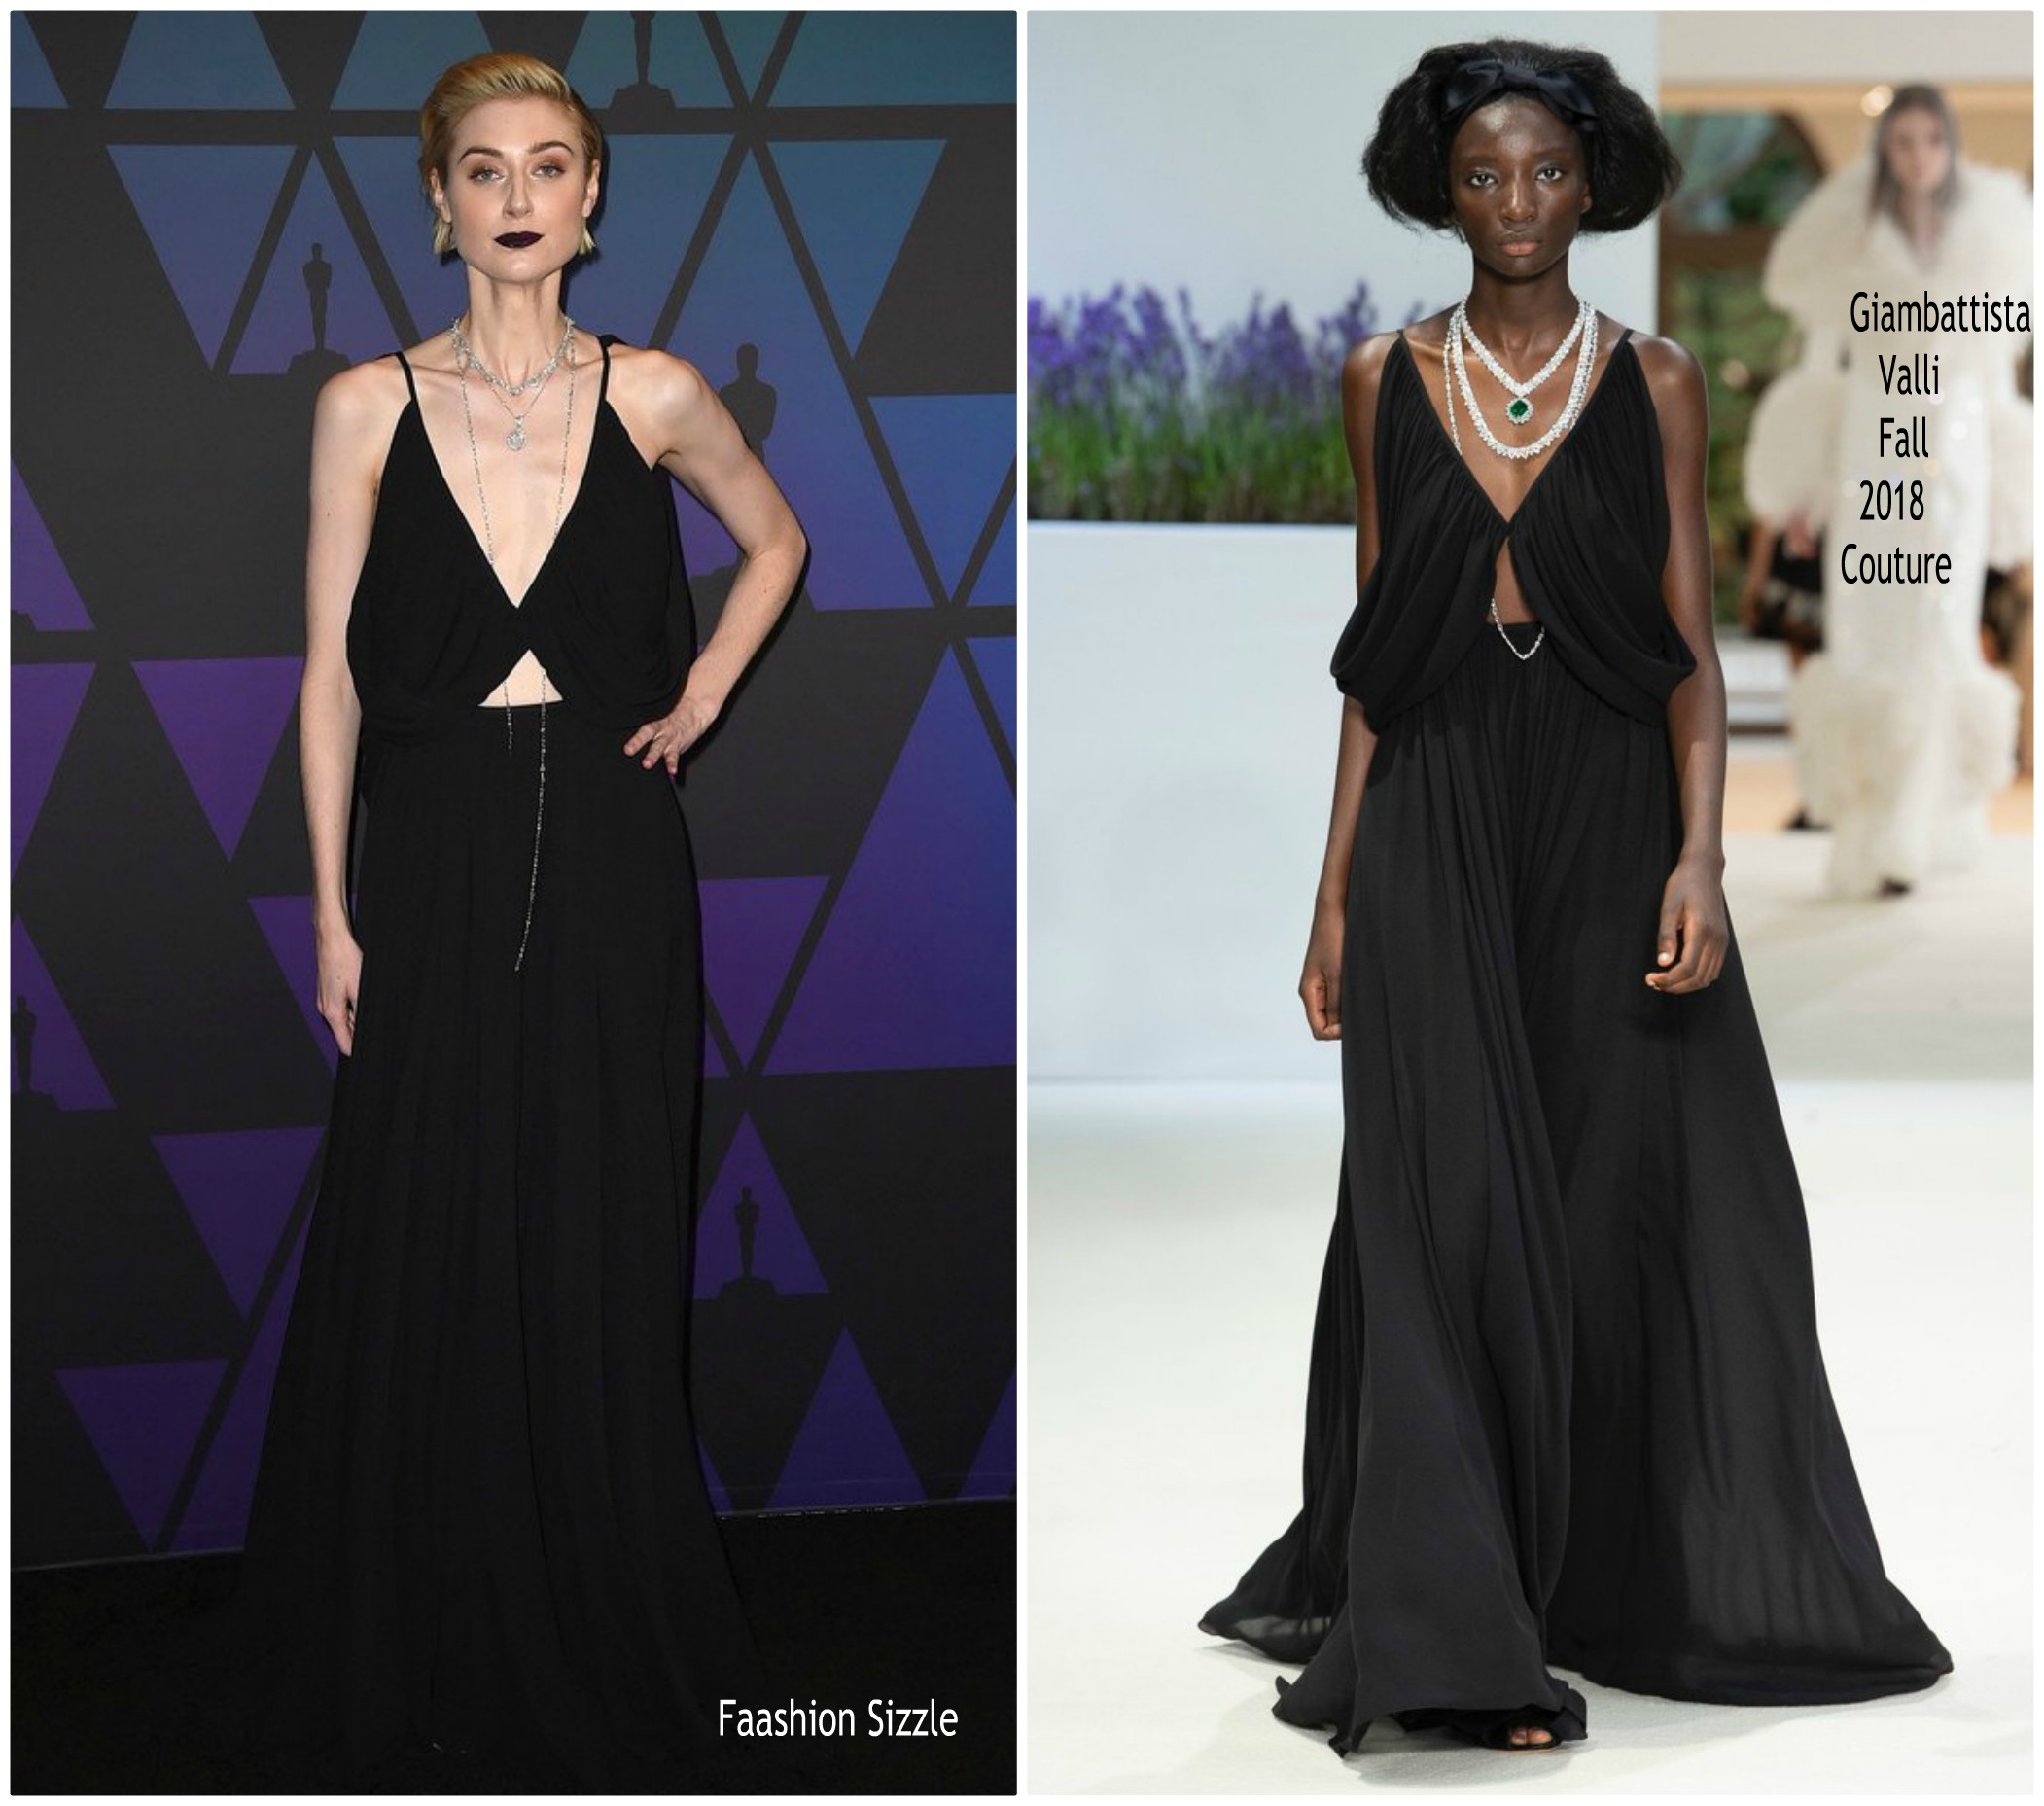 elizabeth-debicki-in-giambattista-couture-2018-governors-awards